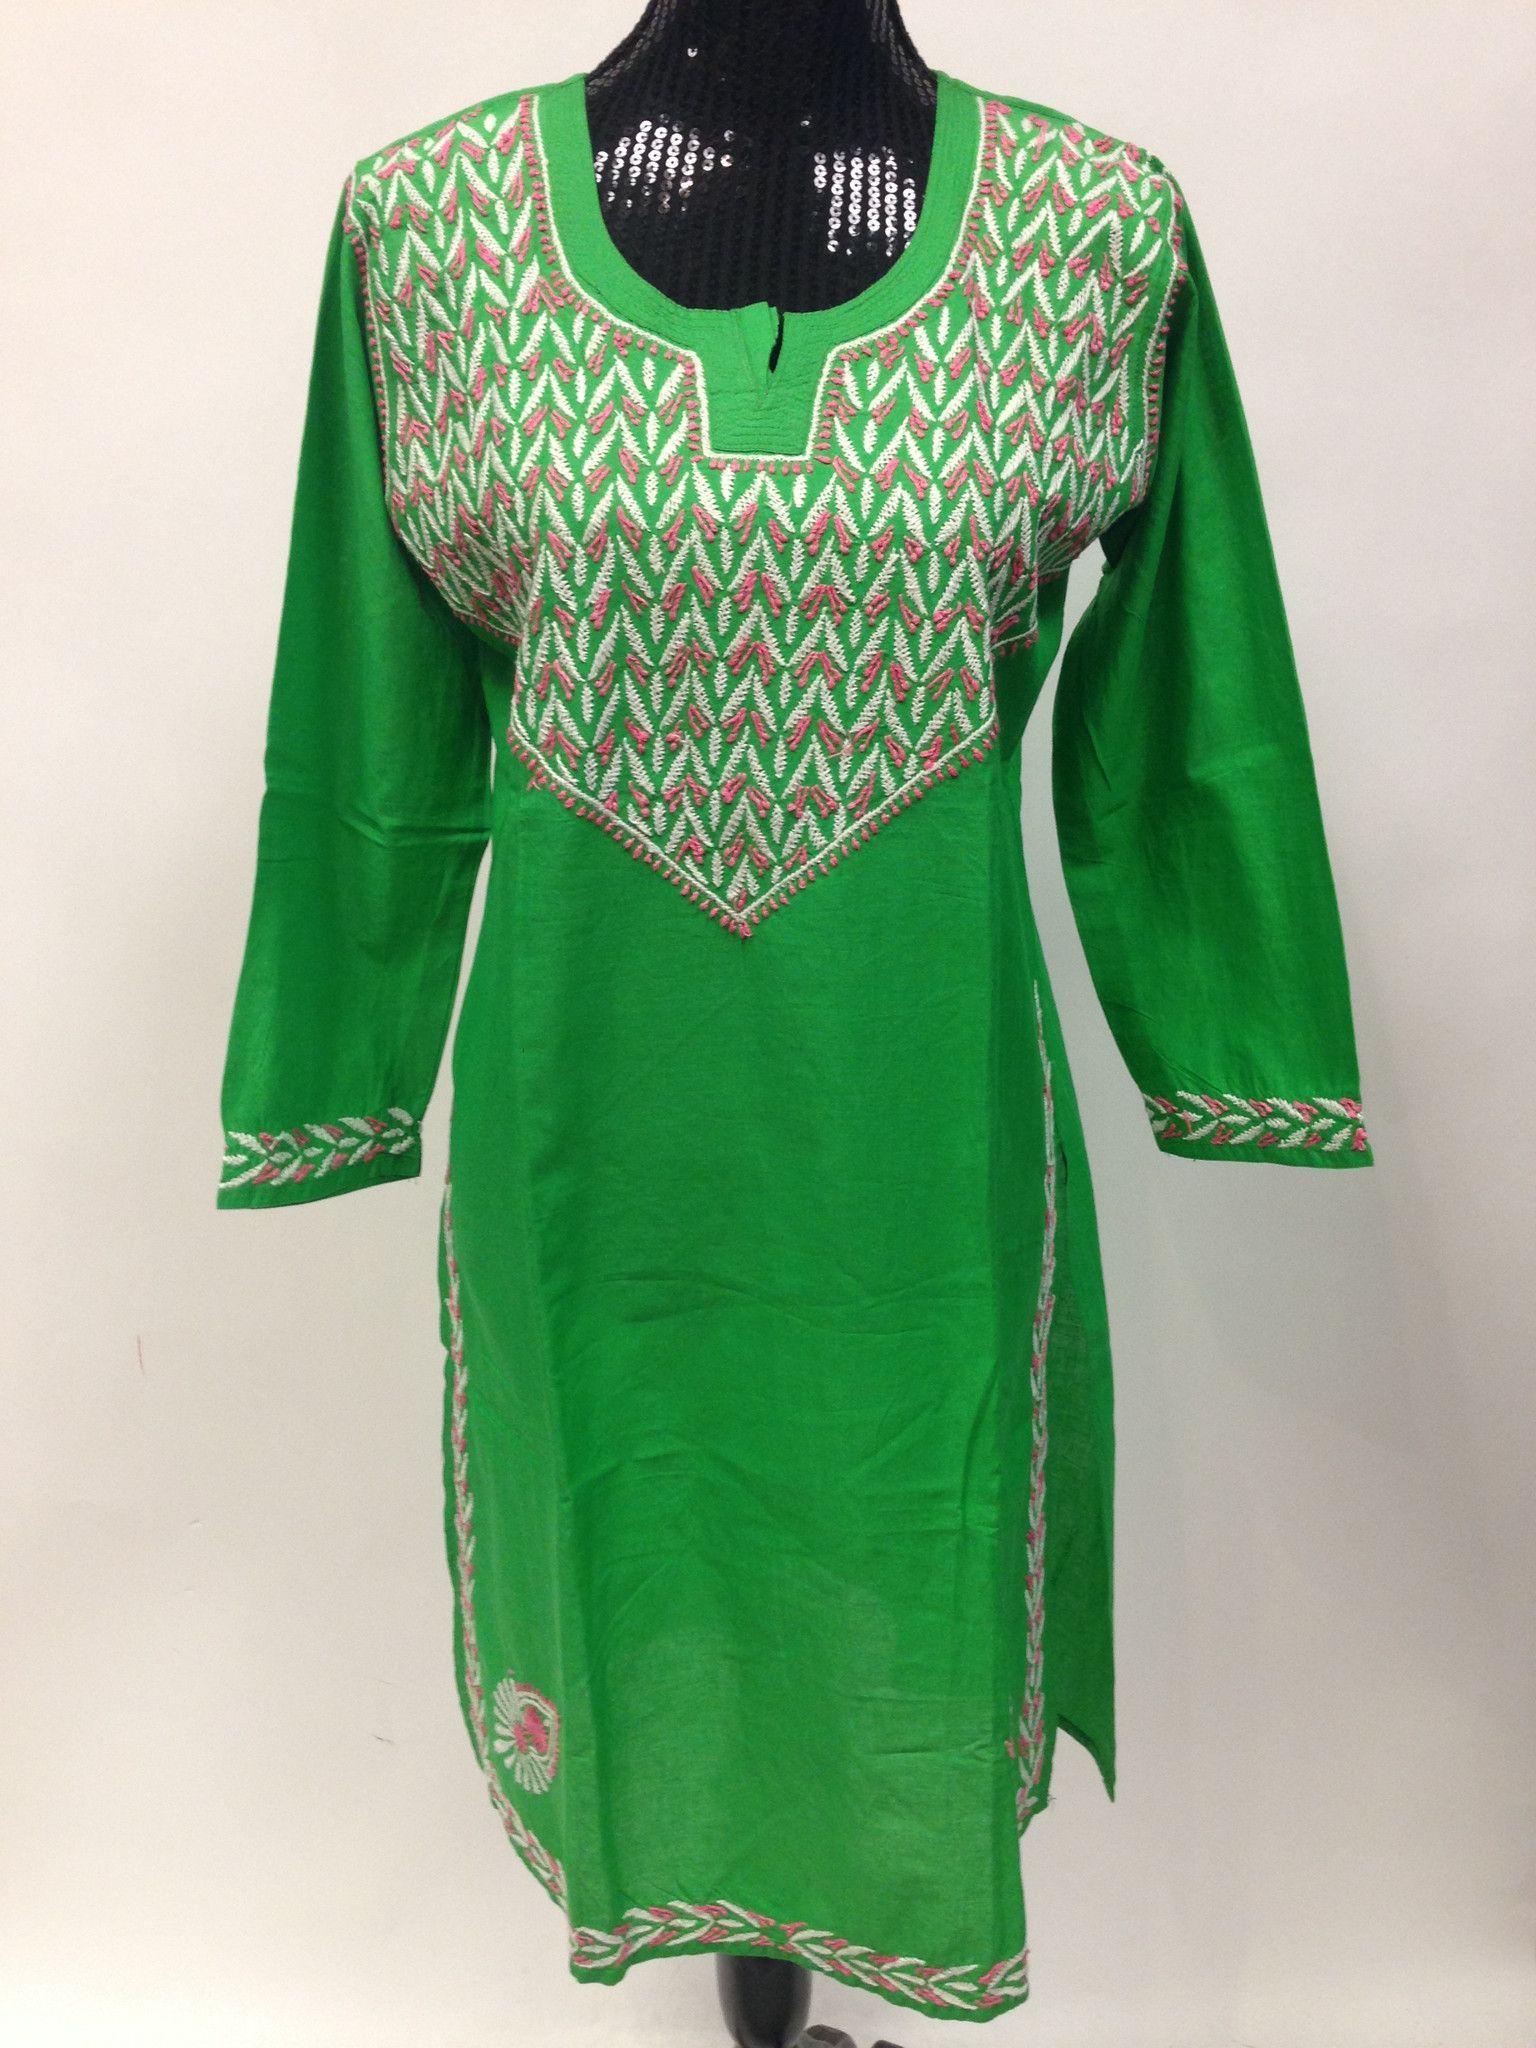 Lucknowi chikankari long kurti green ethnic indian dress